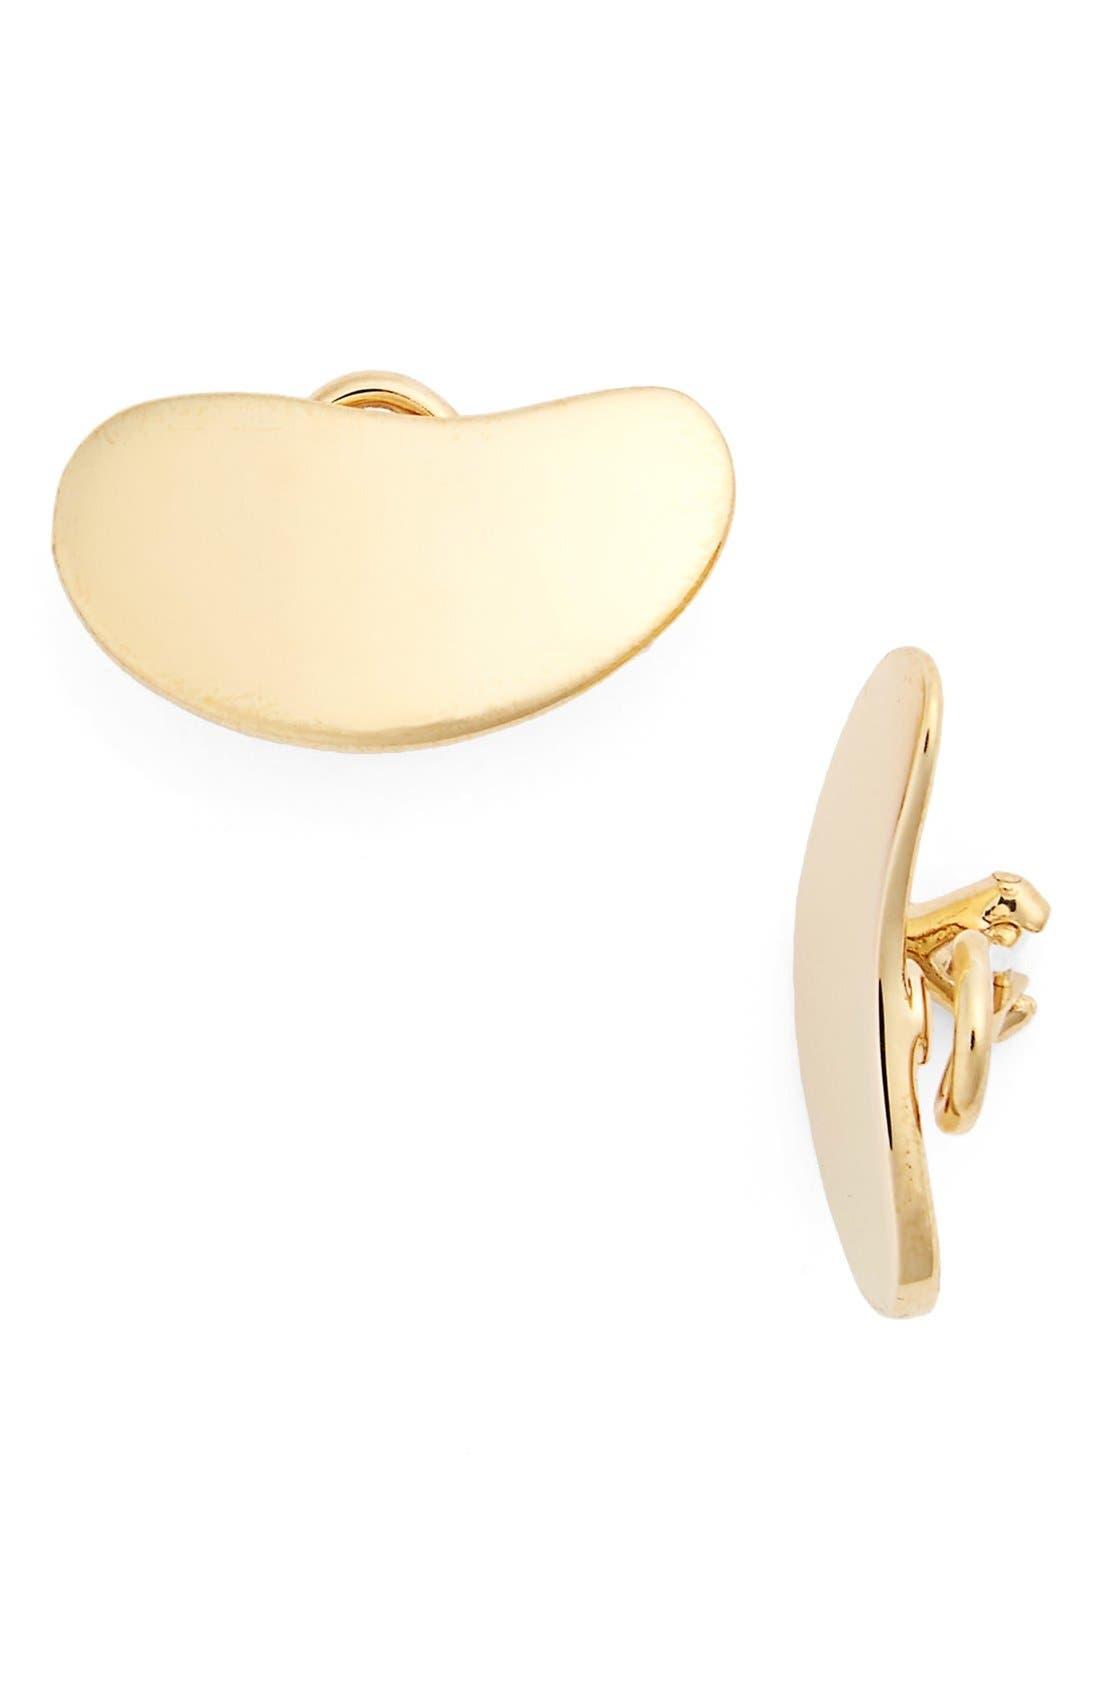 Main Image - Charlotte Chesnais 'Nues' Vermeil Clip Earrings